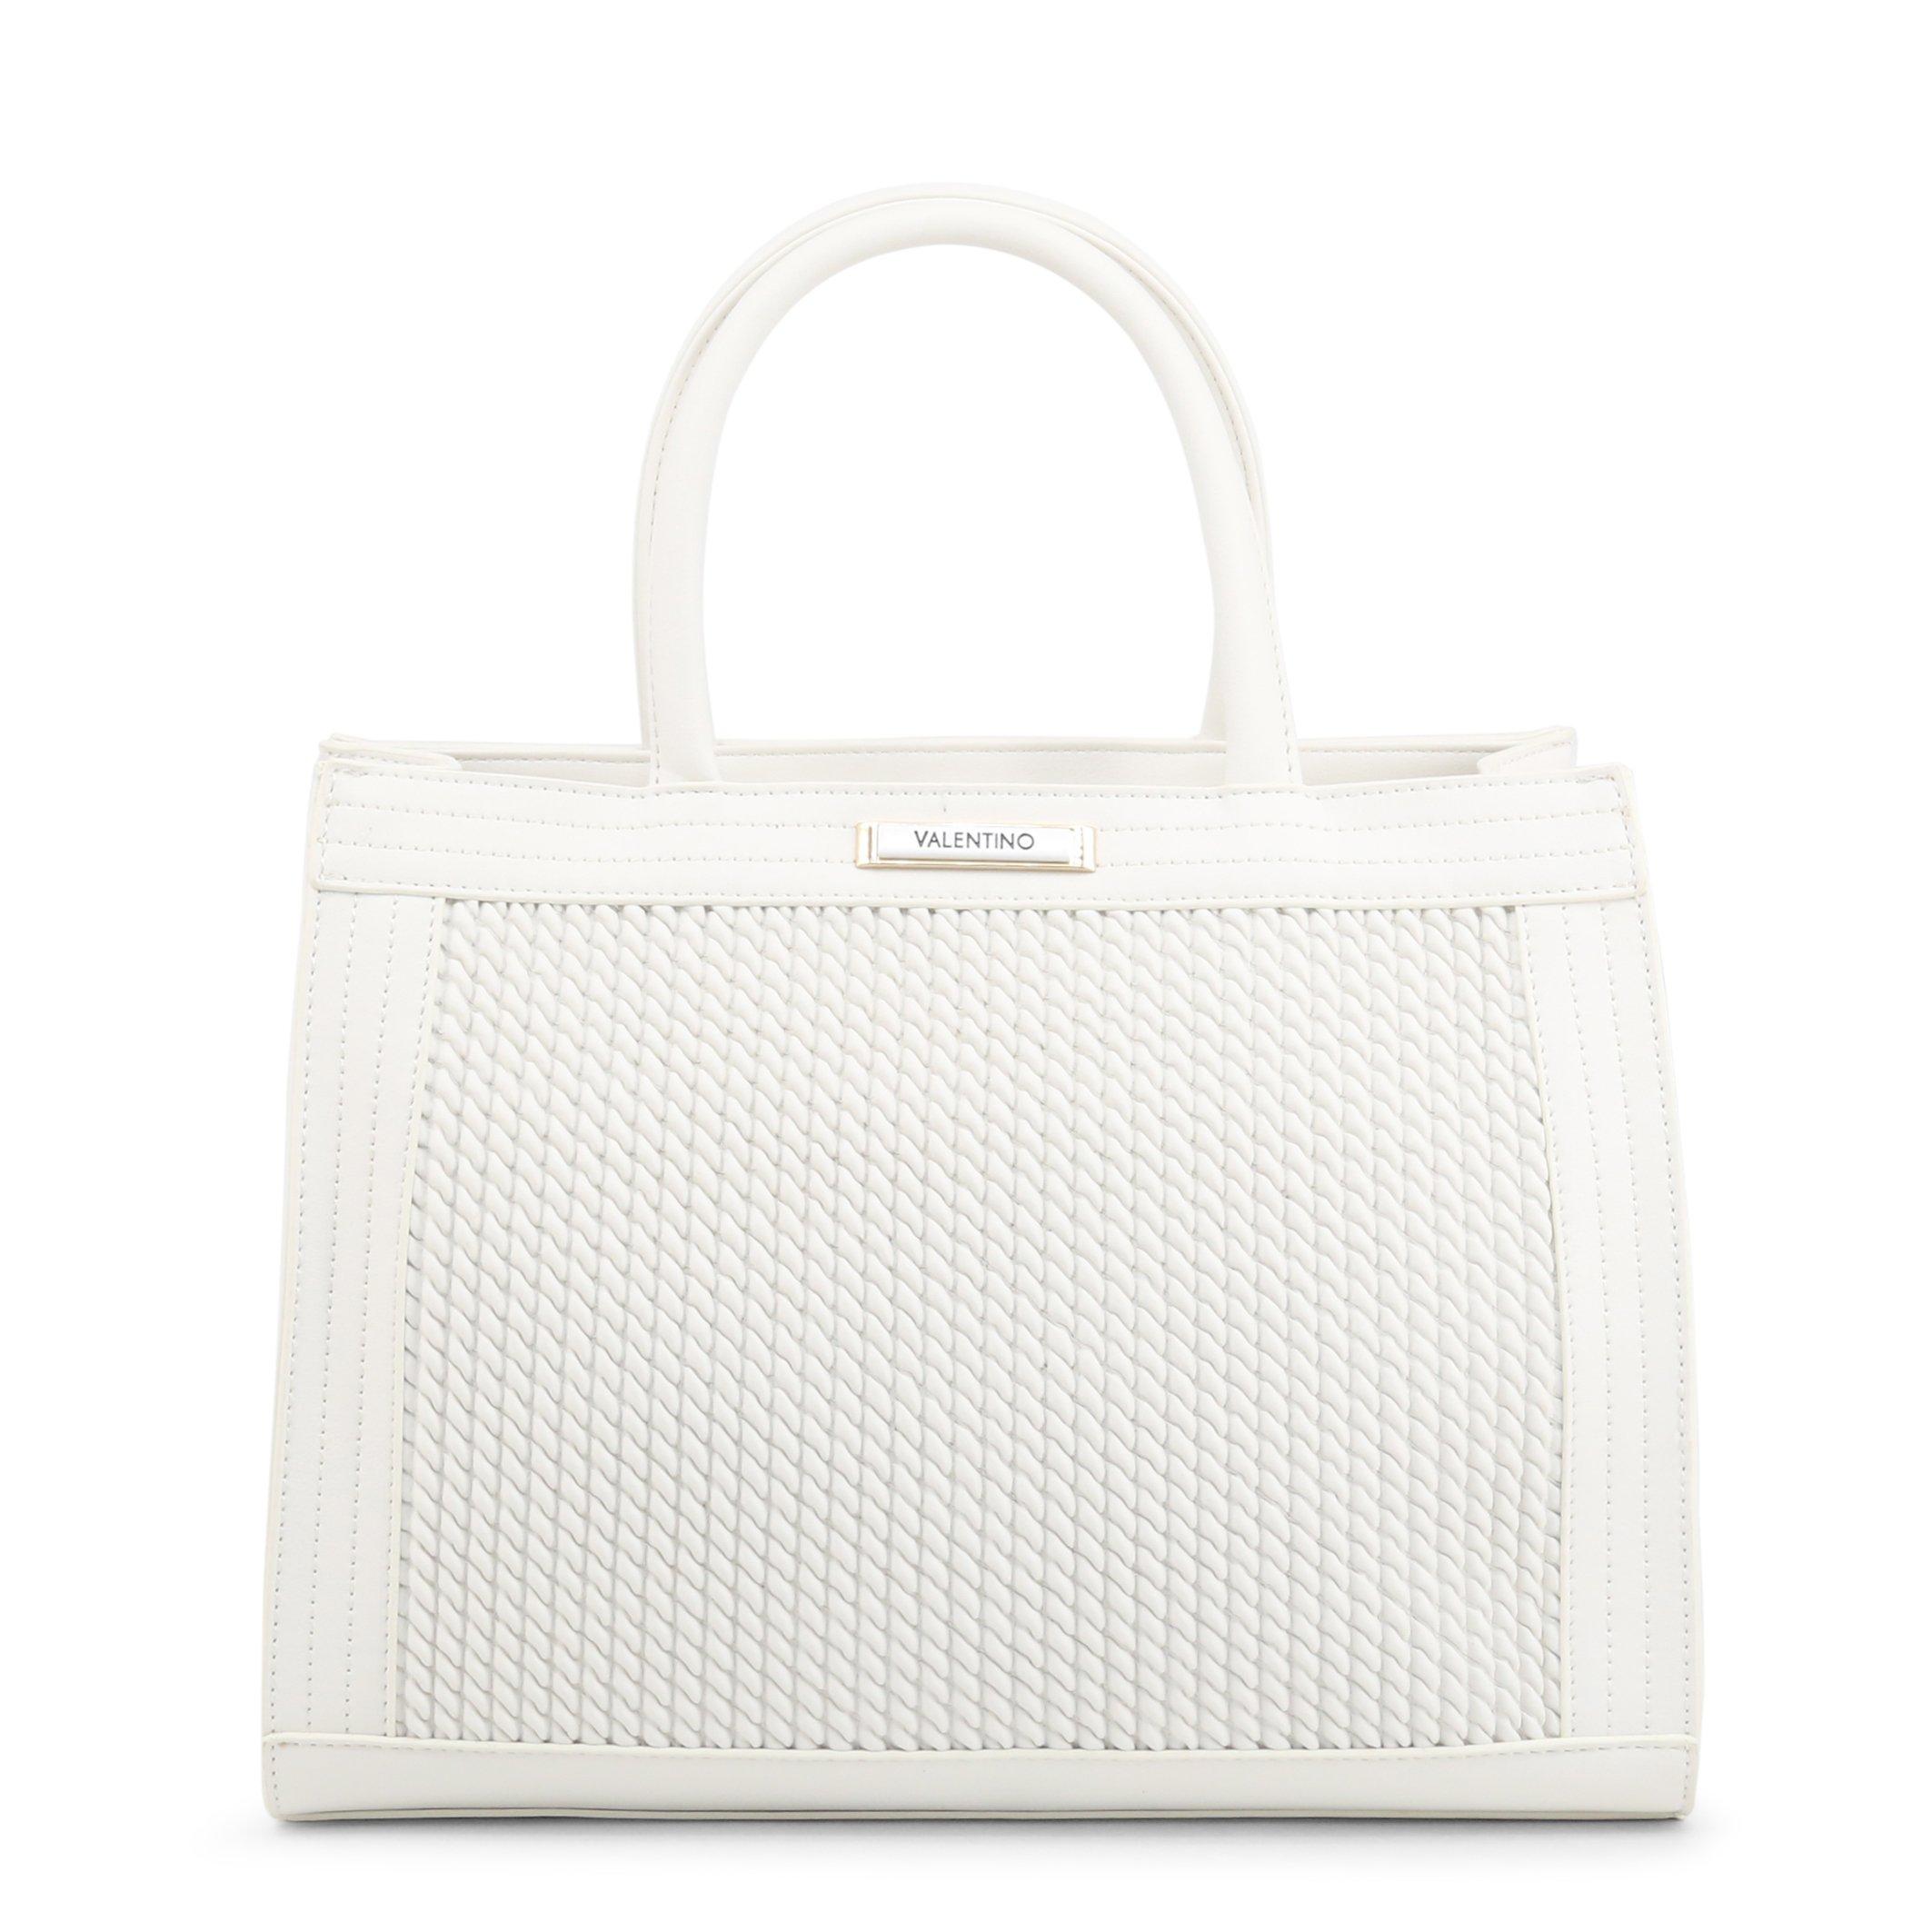 Valentino by Mario Valentino Women's Handbag Various Colours JARVEY-VBS3XQ04 - white NOSIZE